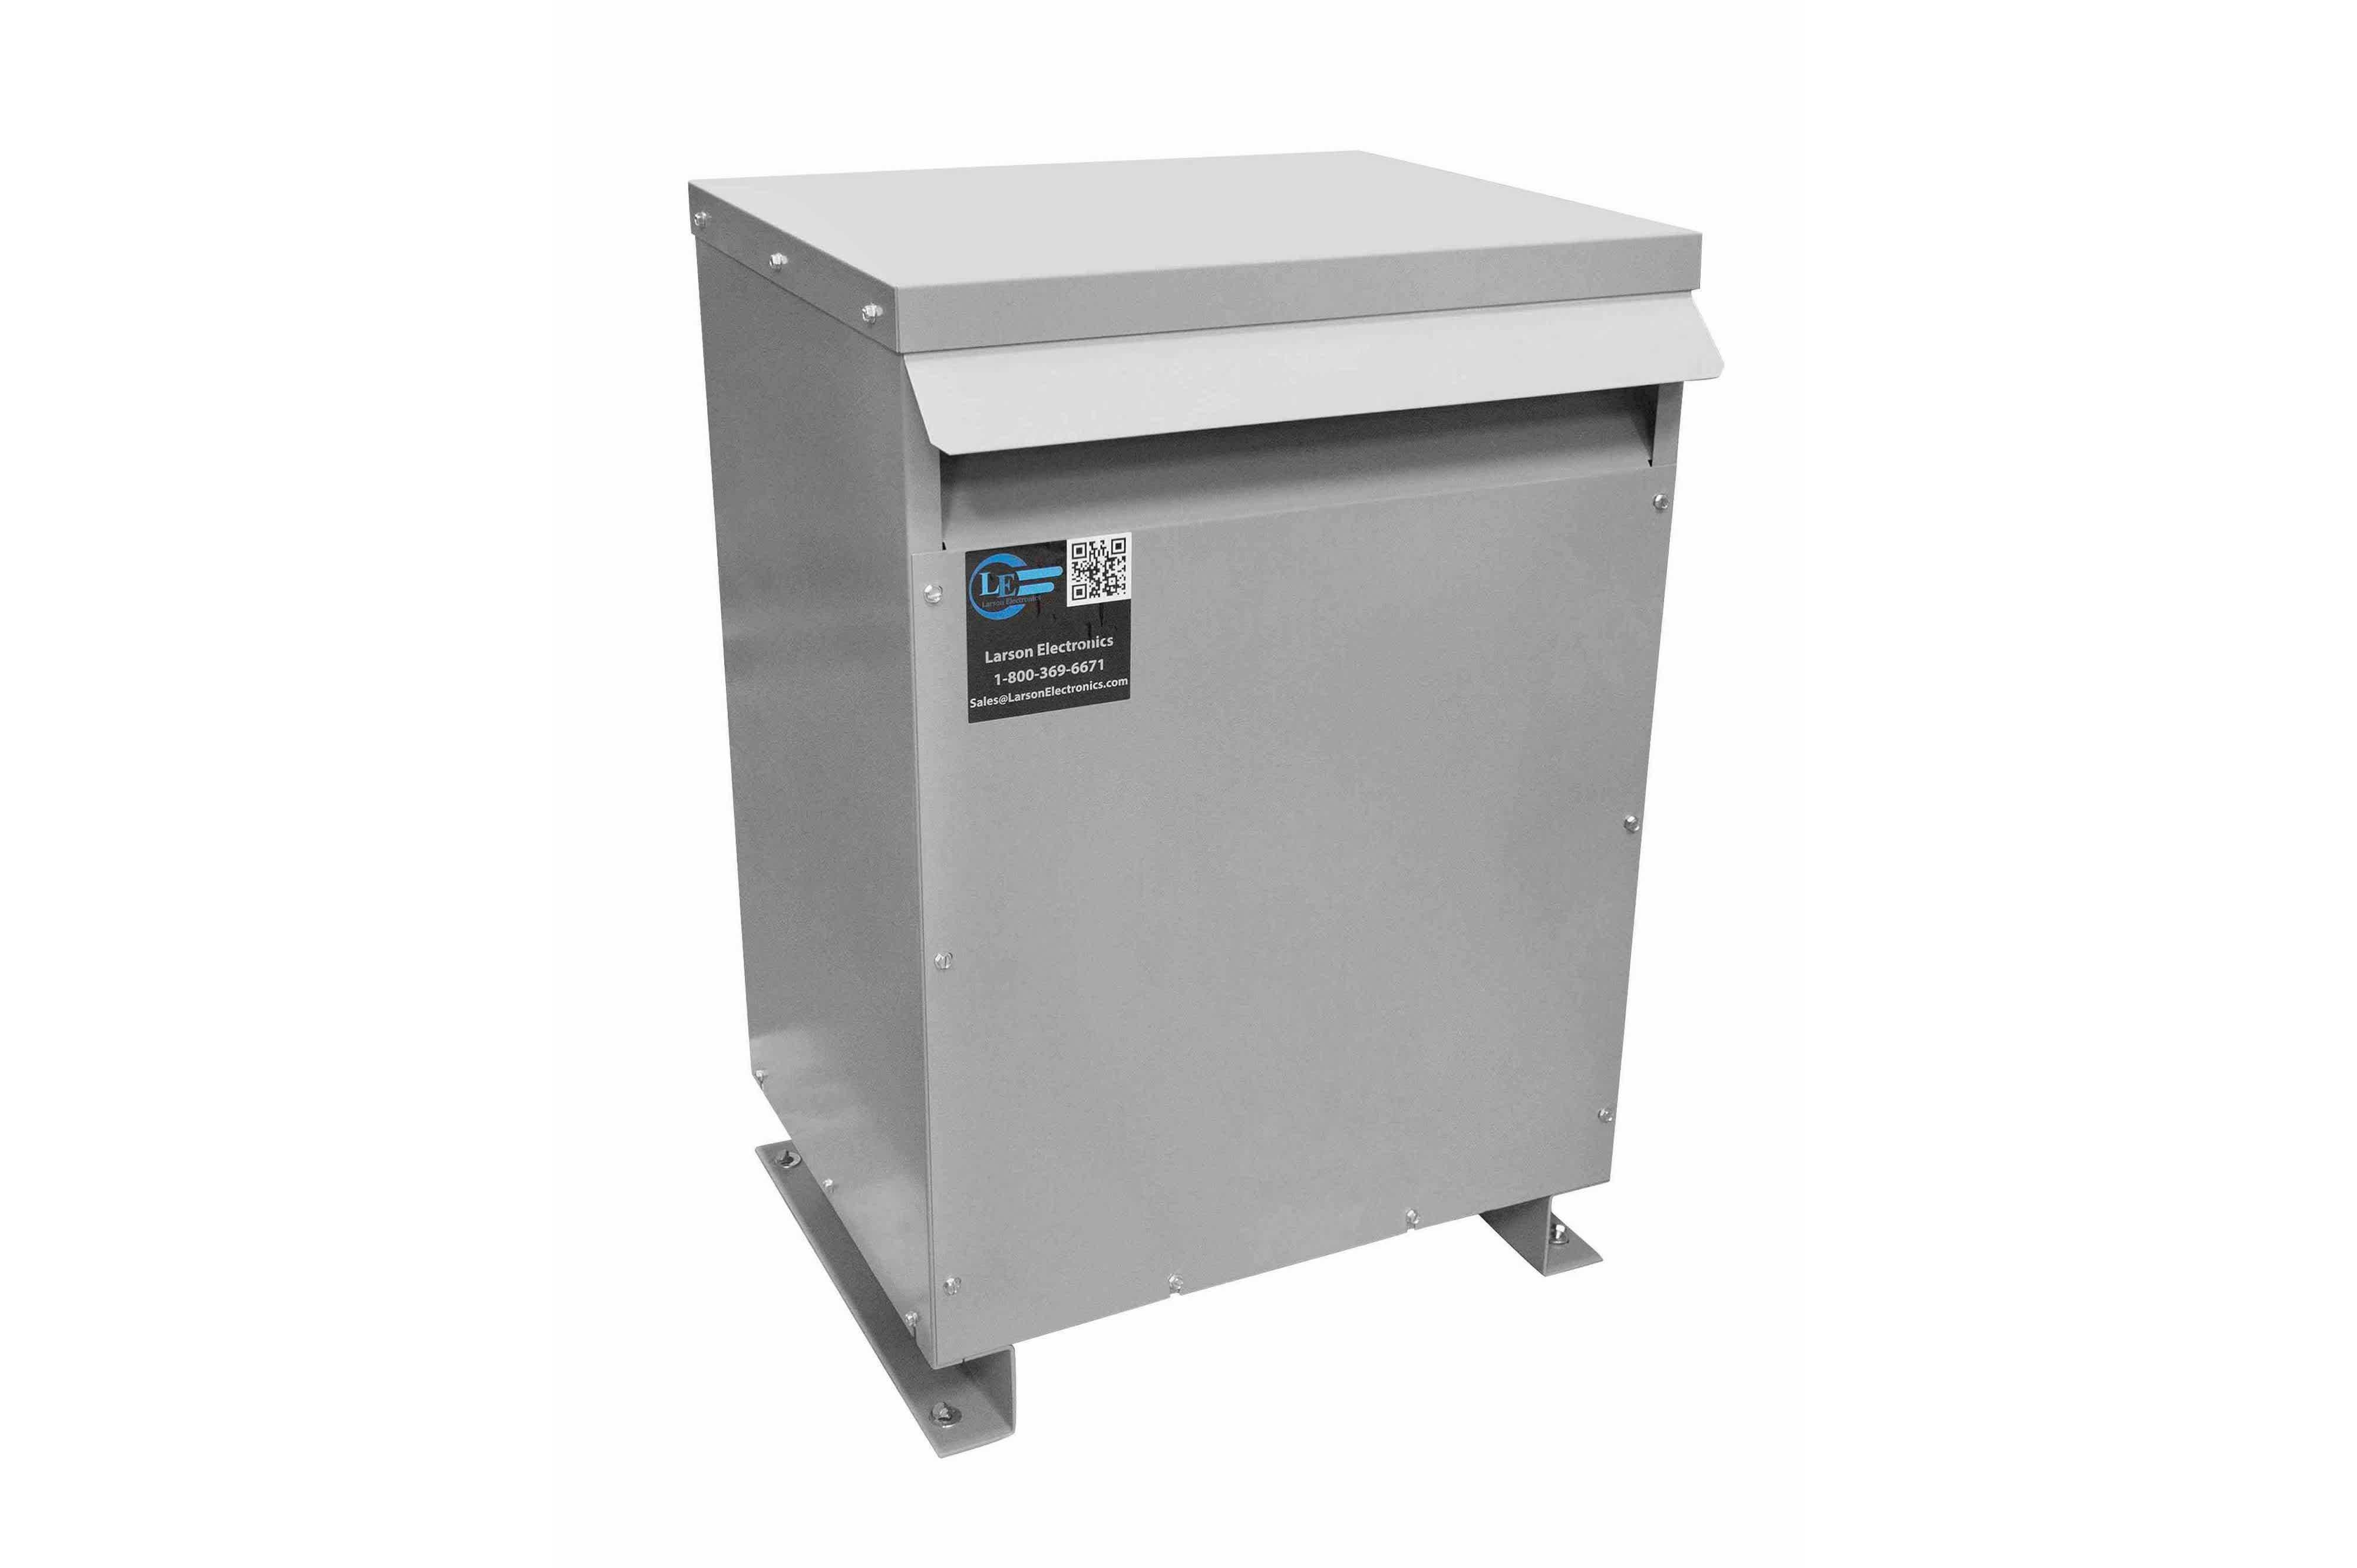 12 kVA 3PH Isolation Transformer, 220V Wye Primary, 208V Delta Secondary, N3R, Ventilated, 60 Hz